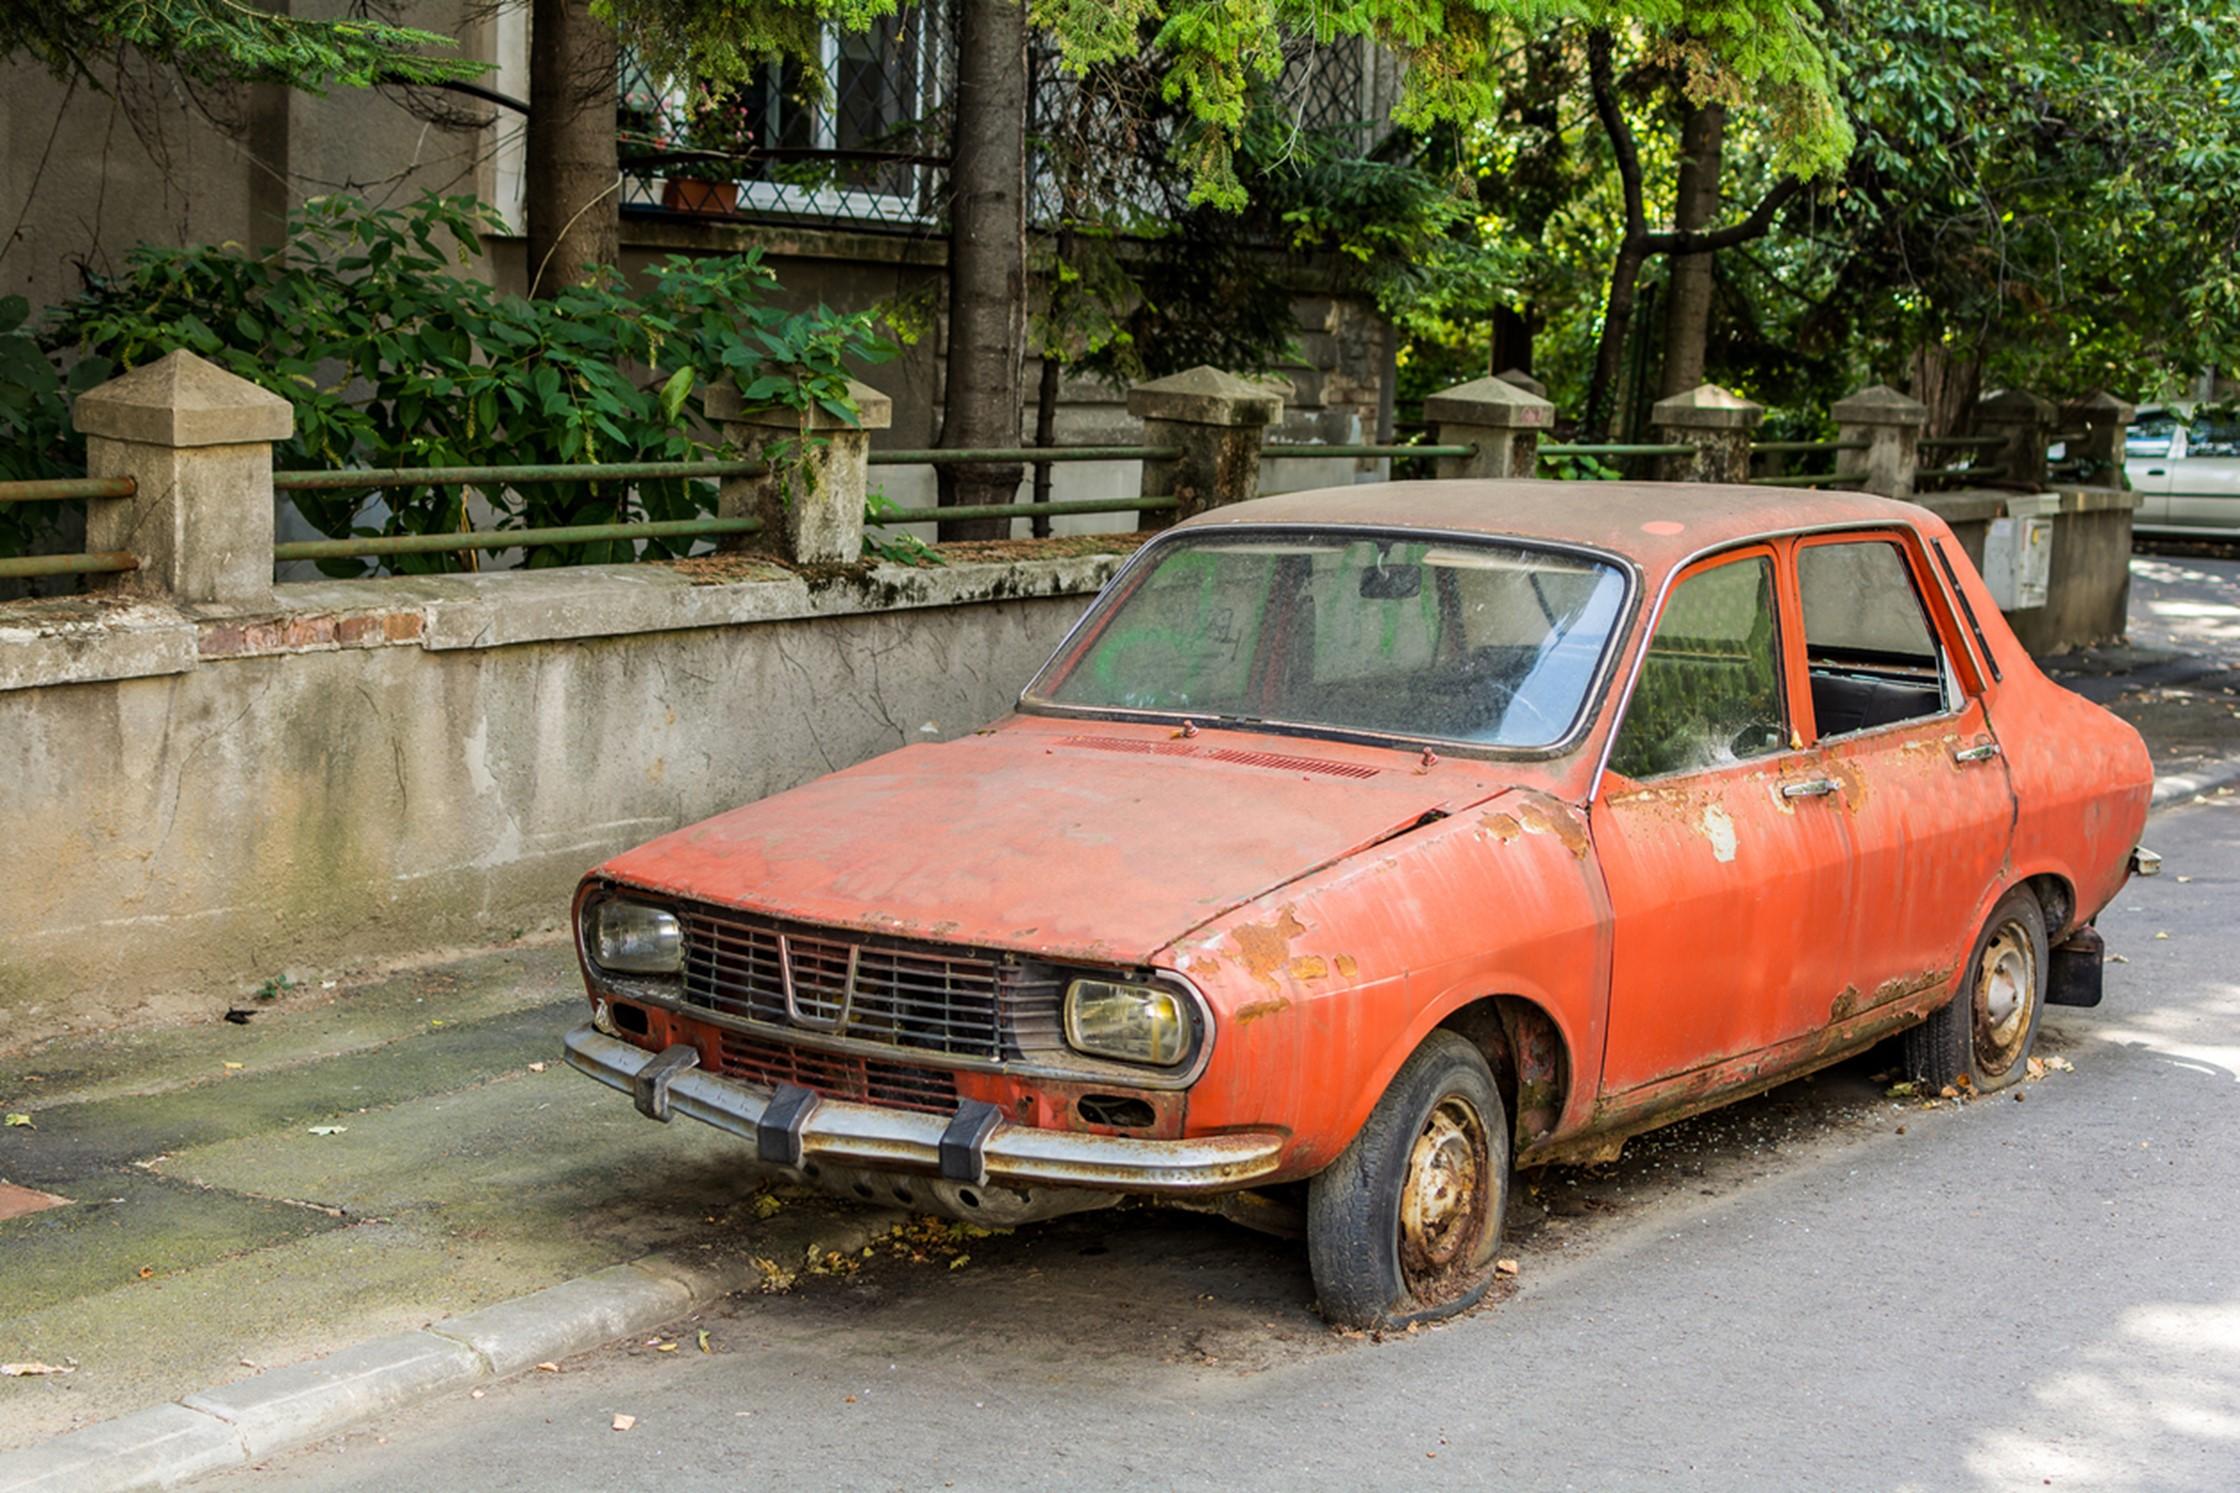 scrap orange car on a road